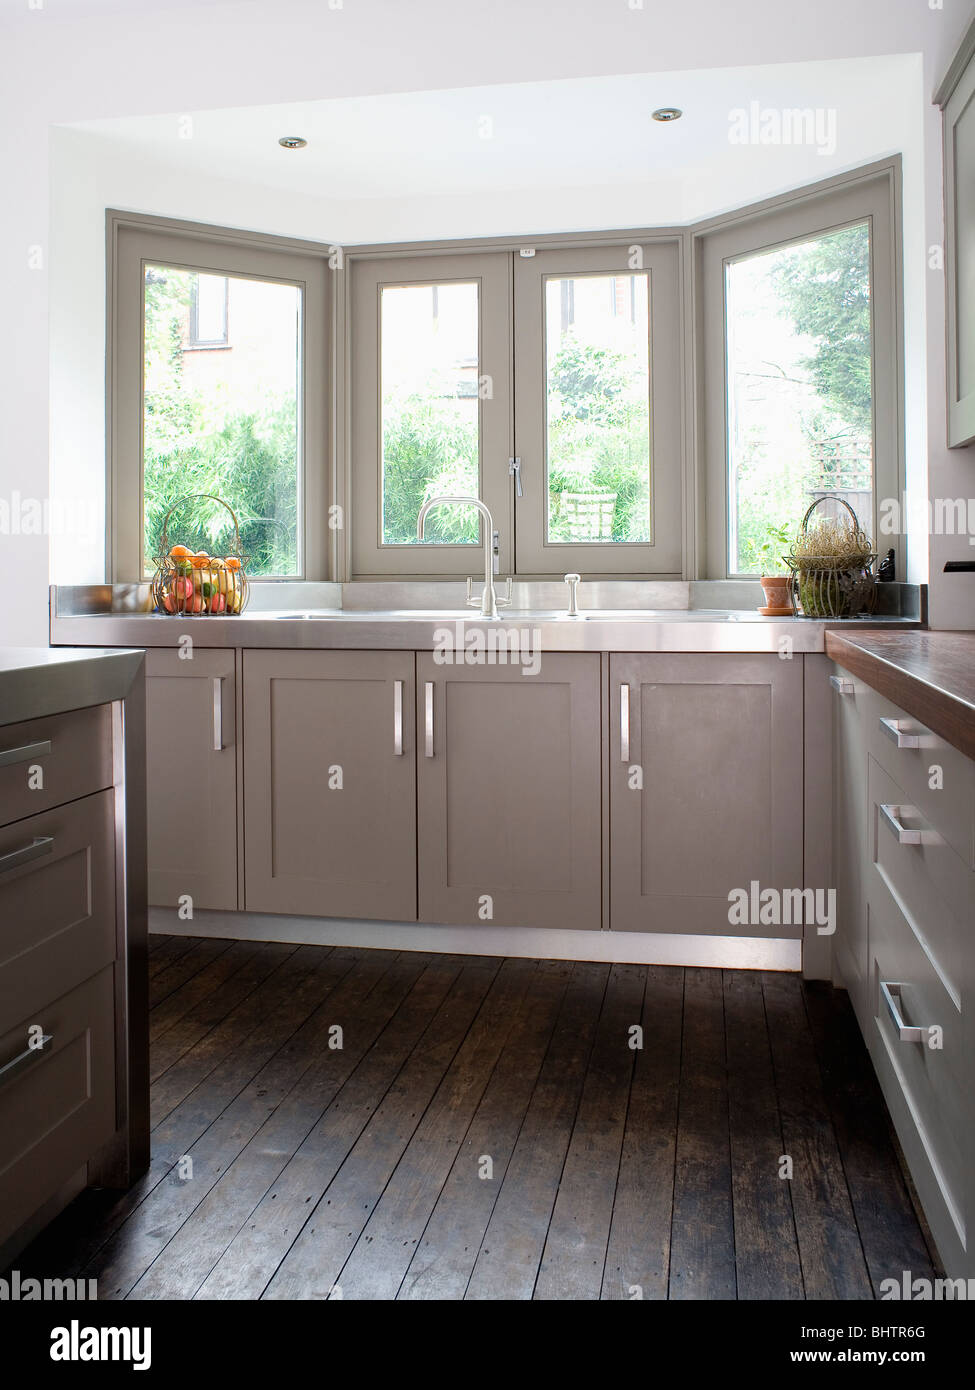 Dark Gray Wooden Flooring In Modern Kitchen With Gray Painted